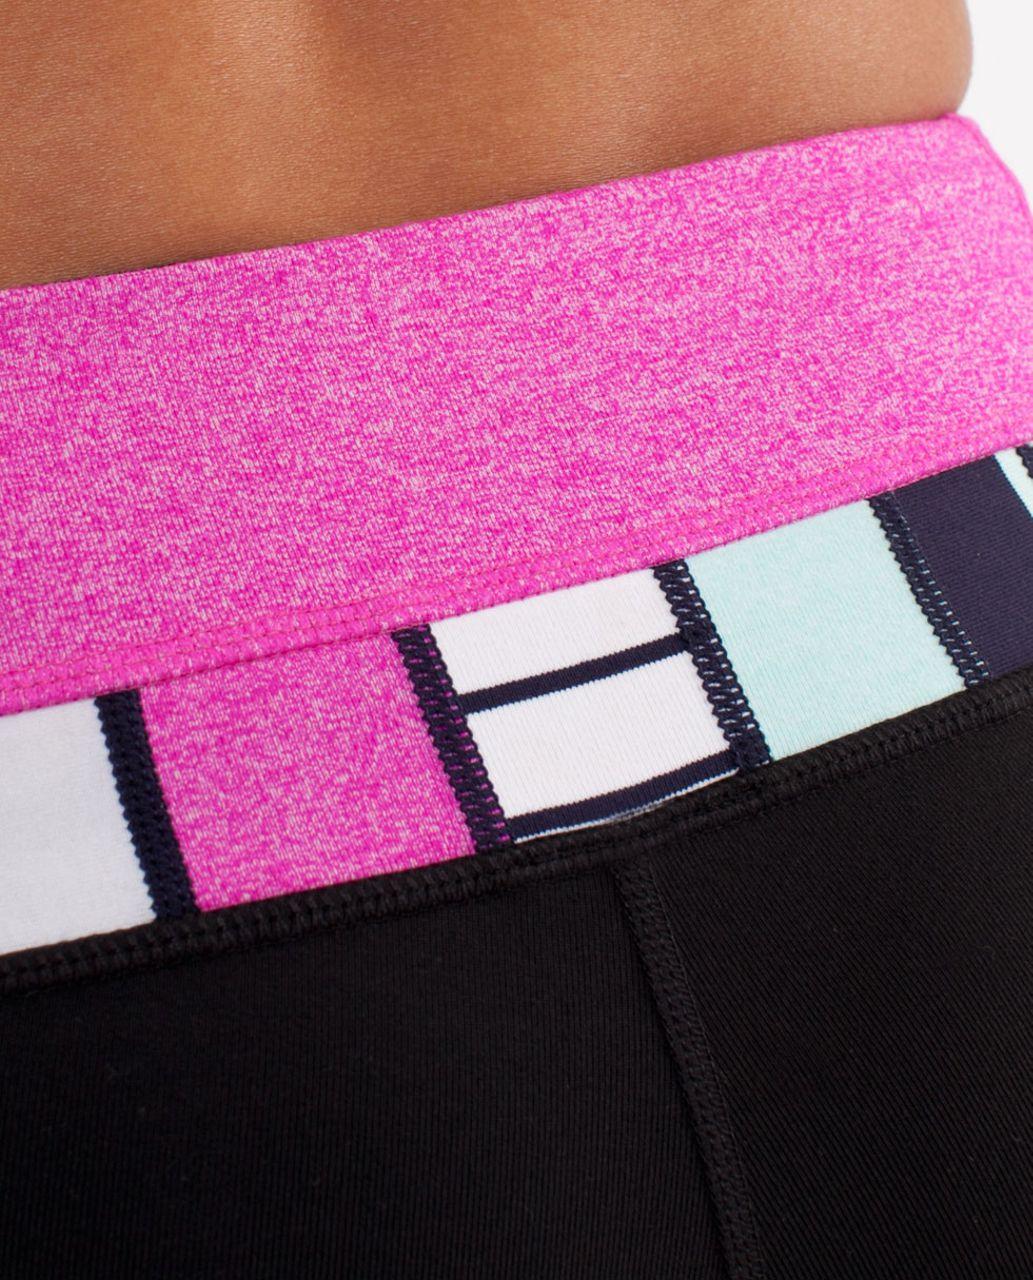 Lululemon Groove Pant (Regular) - Black /  Heathered Paris Pink /  Quilting Spring 14